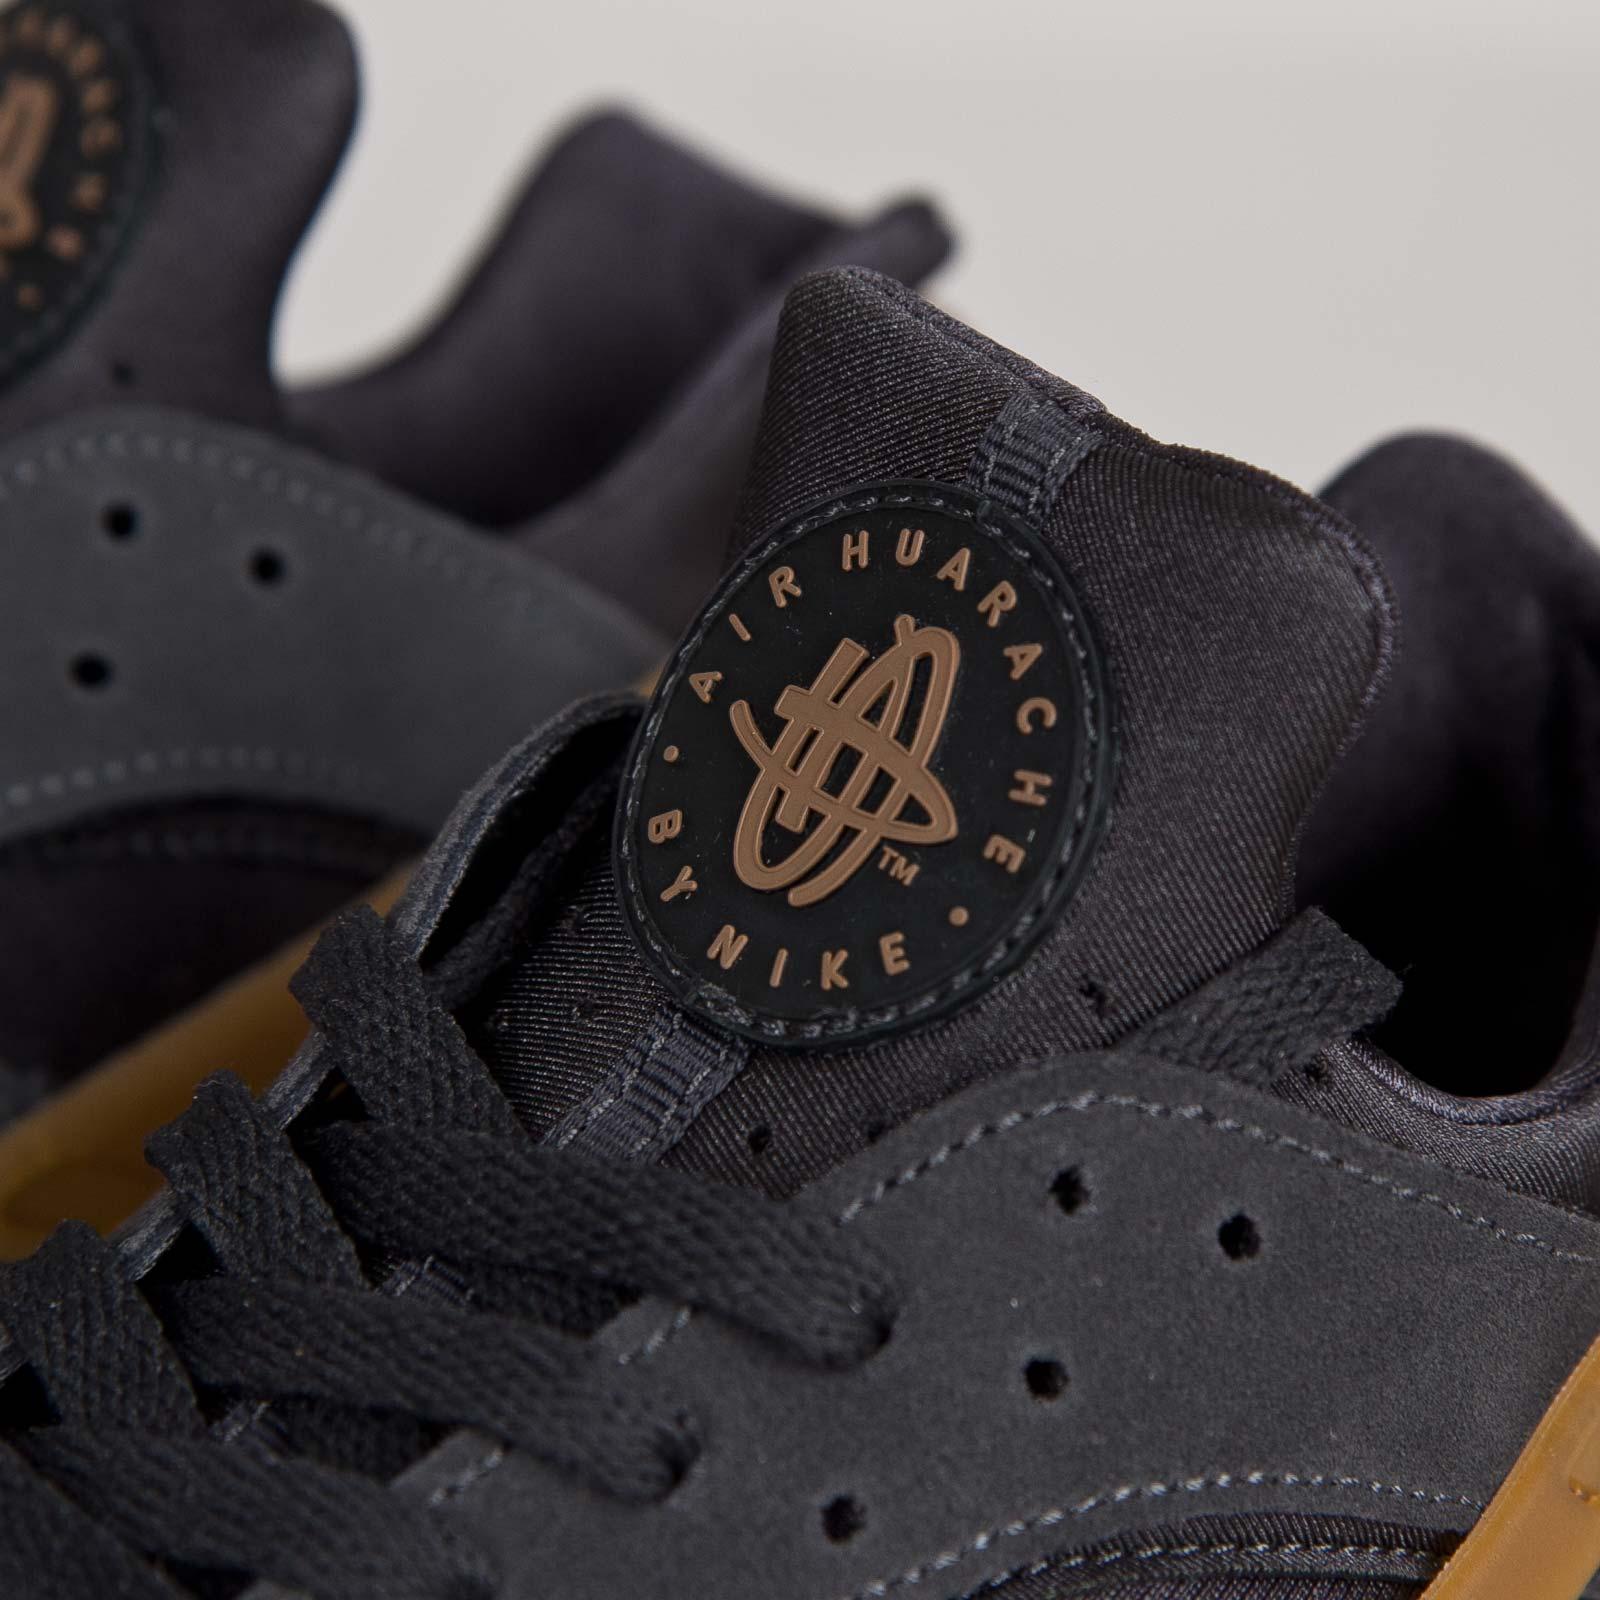 mantequilla Nacarado donde quiera  Nike Air Huarache - 318429-090 - Sneakersnstuff | sneakers & streetwear  online since 1999